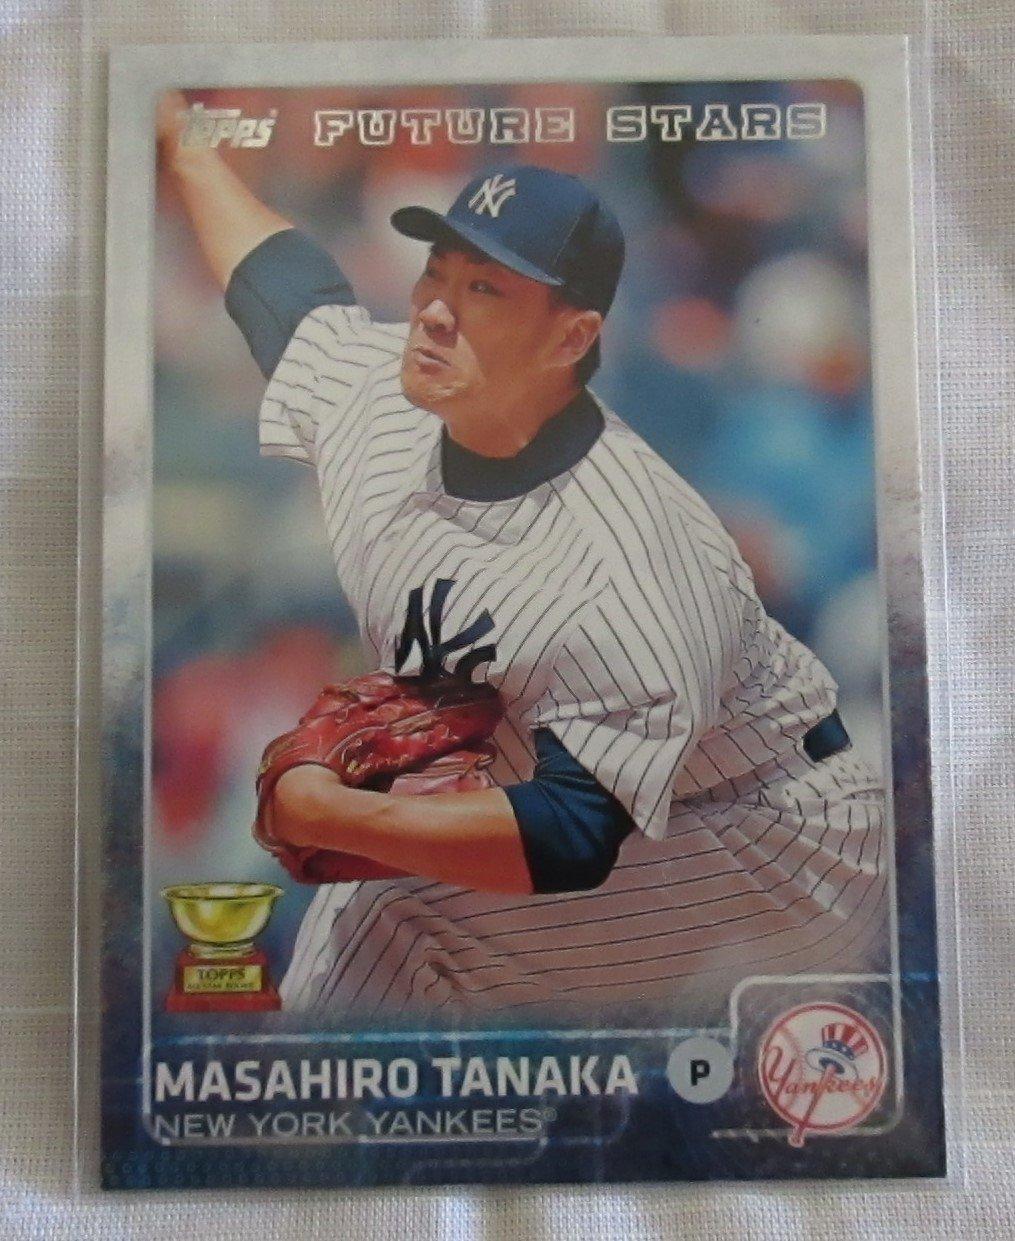 79bf513b820 MASAHIRO TANAKA 2015 TOPPS BASEBALL CARD  142 - FUTURE STAR (TOPPS ALL STAR  ROOKIE - NEW YORK YANKEES) at Amazon s Sports Collectibles Store